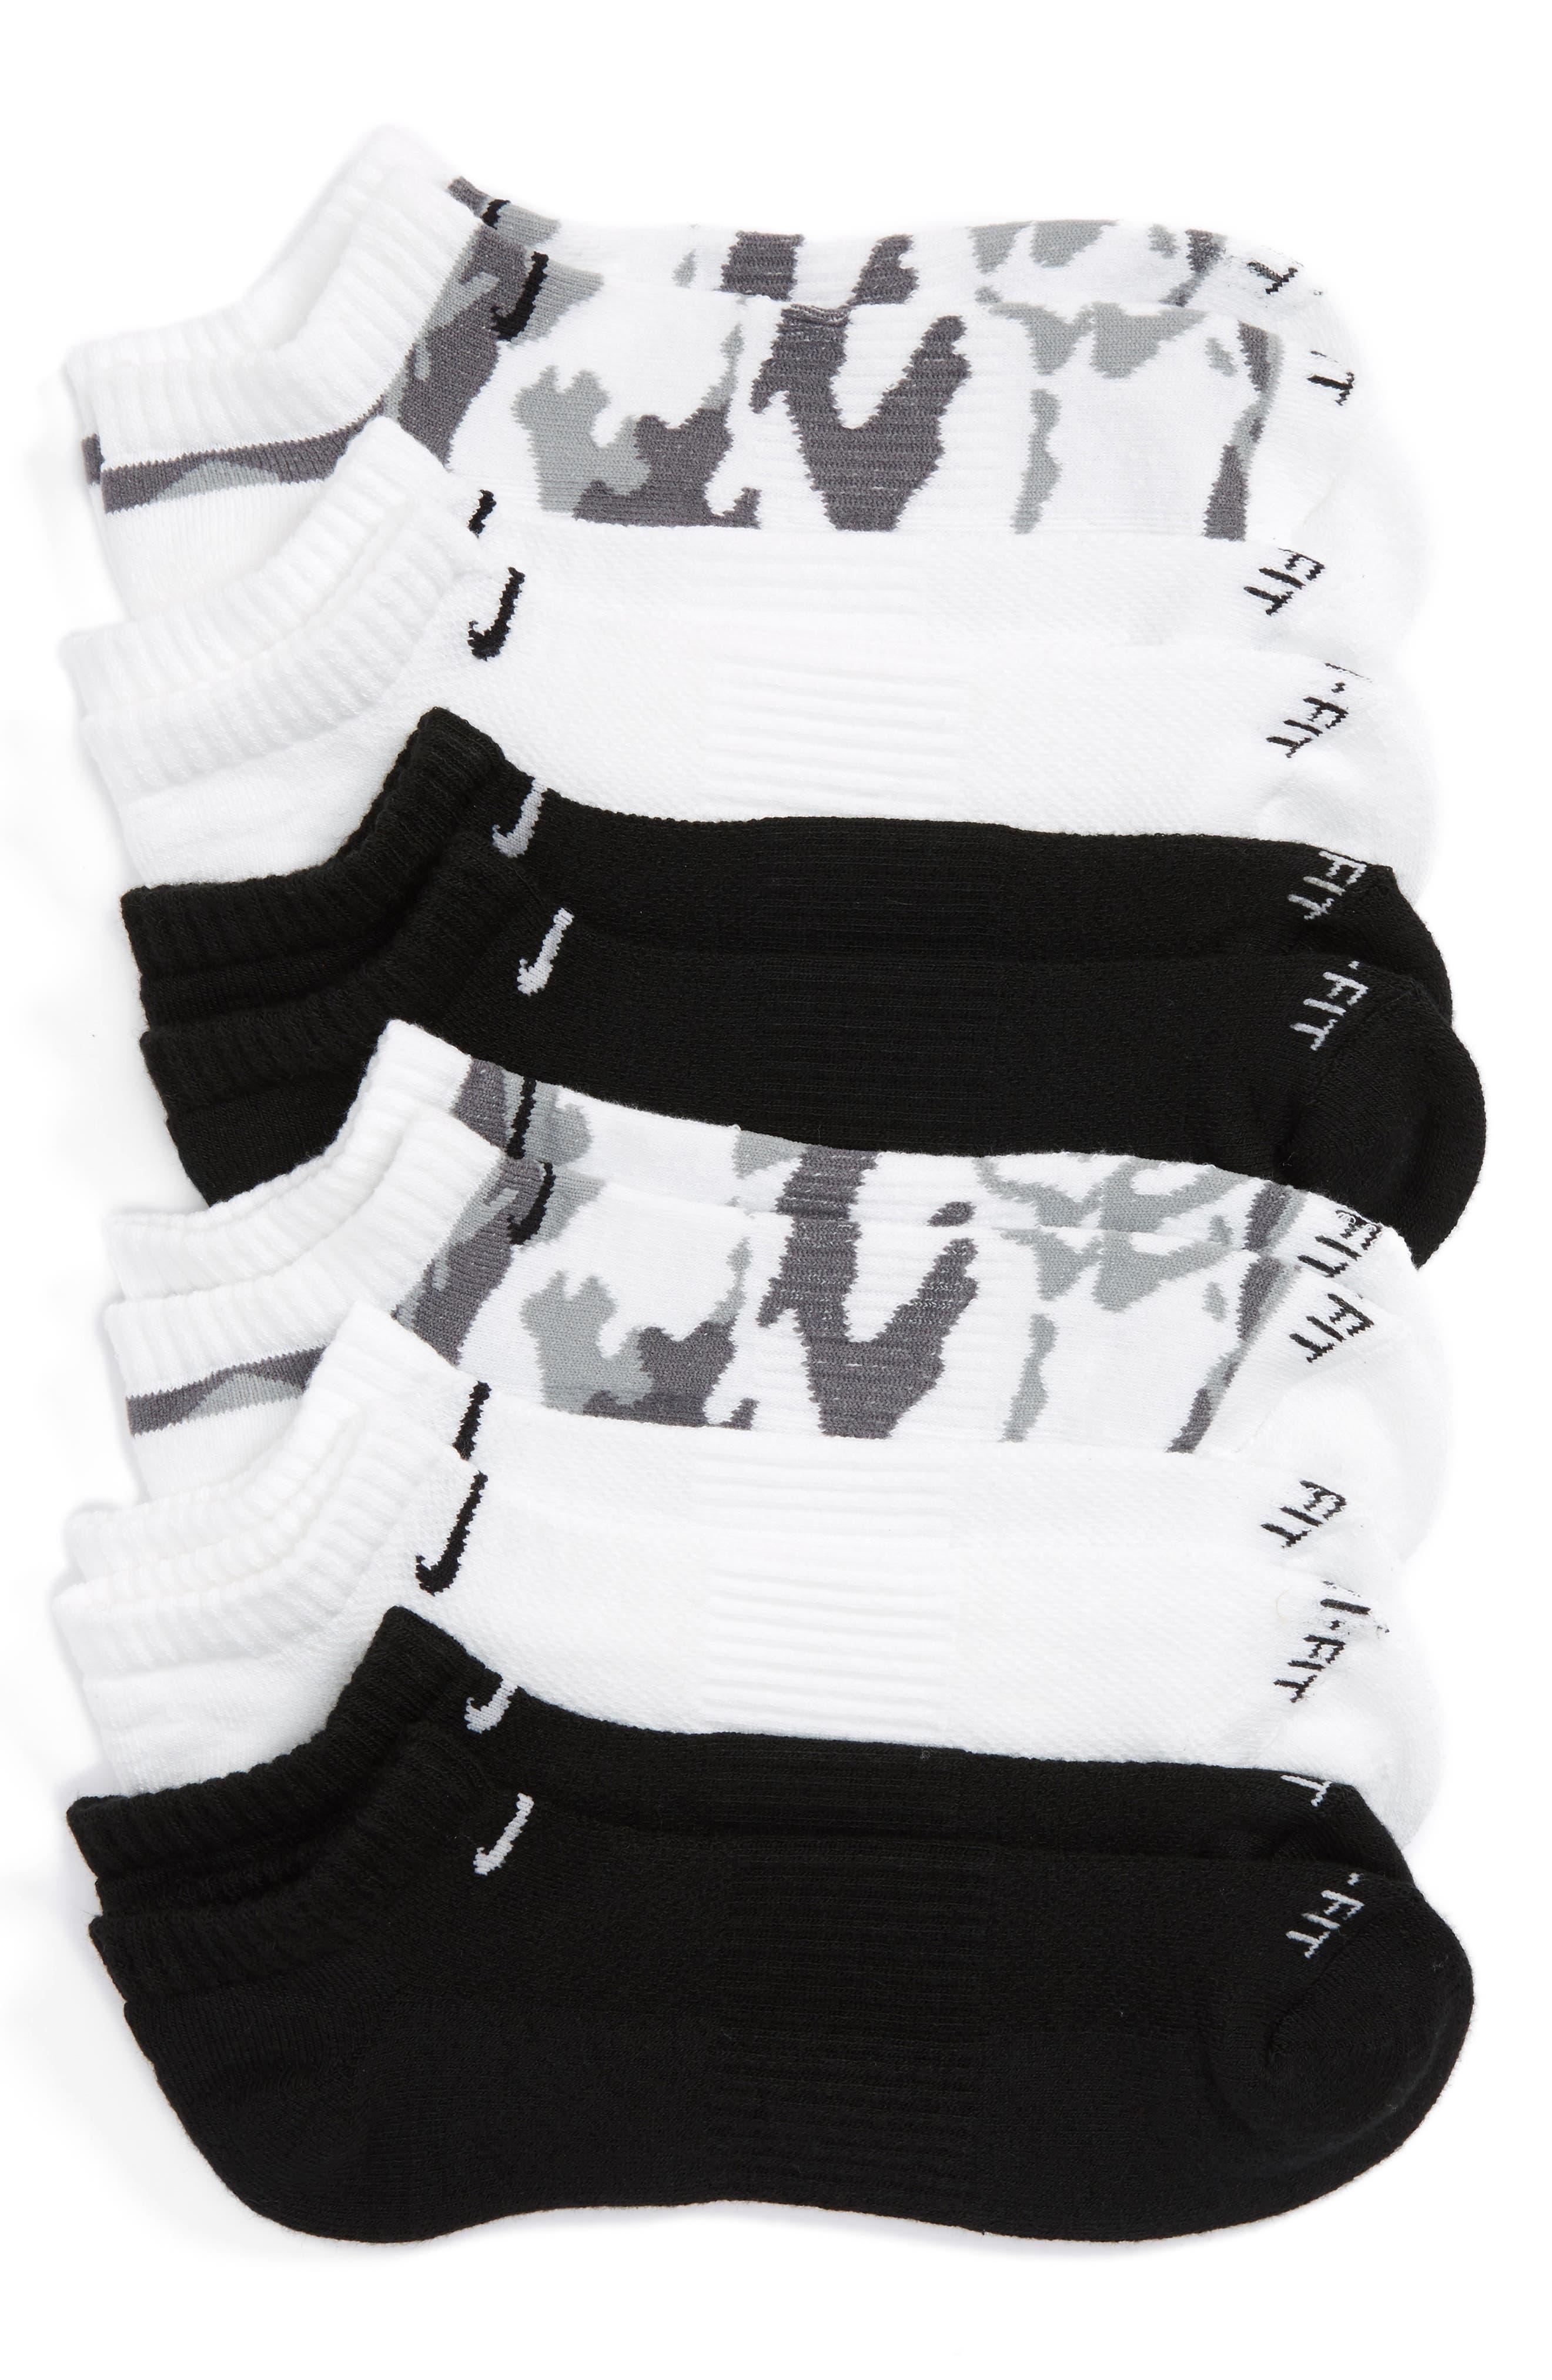 6-Pack Dri-FIT No-Show Socks, Main, color, 020